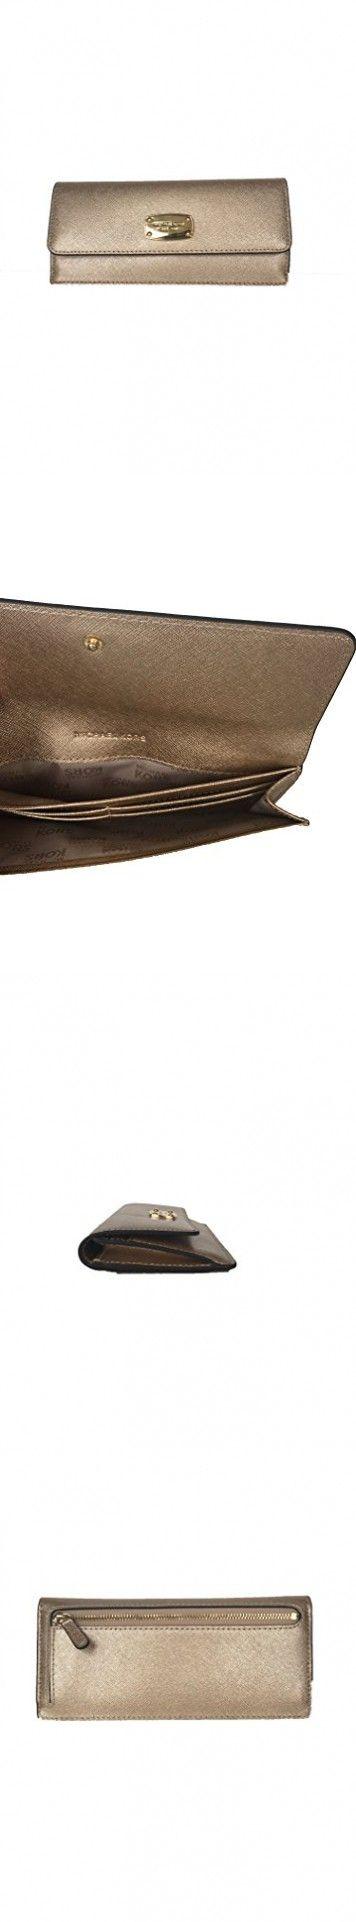 Michael Kors Jet Set Travel Pale Gold Leather Flat Wallet